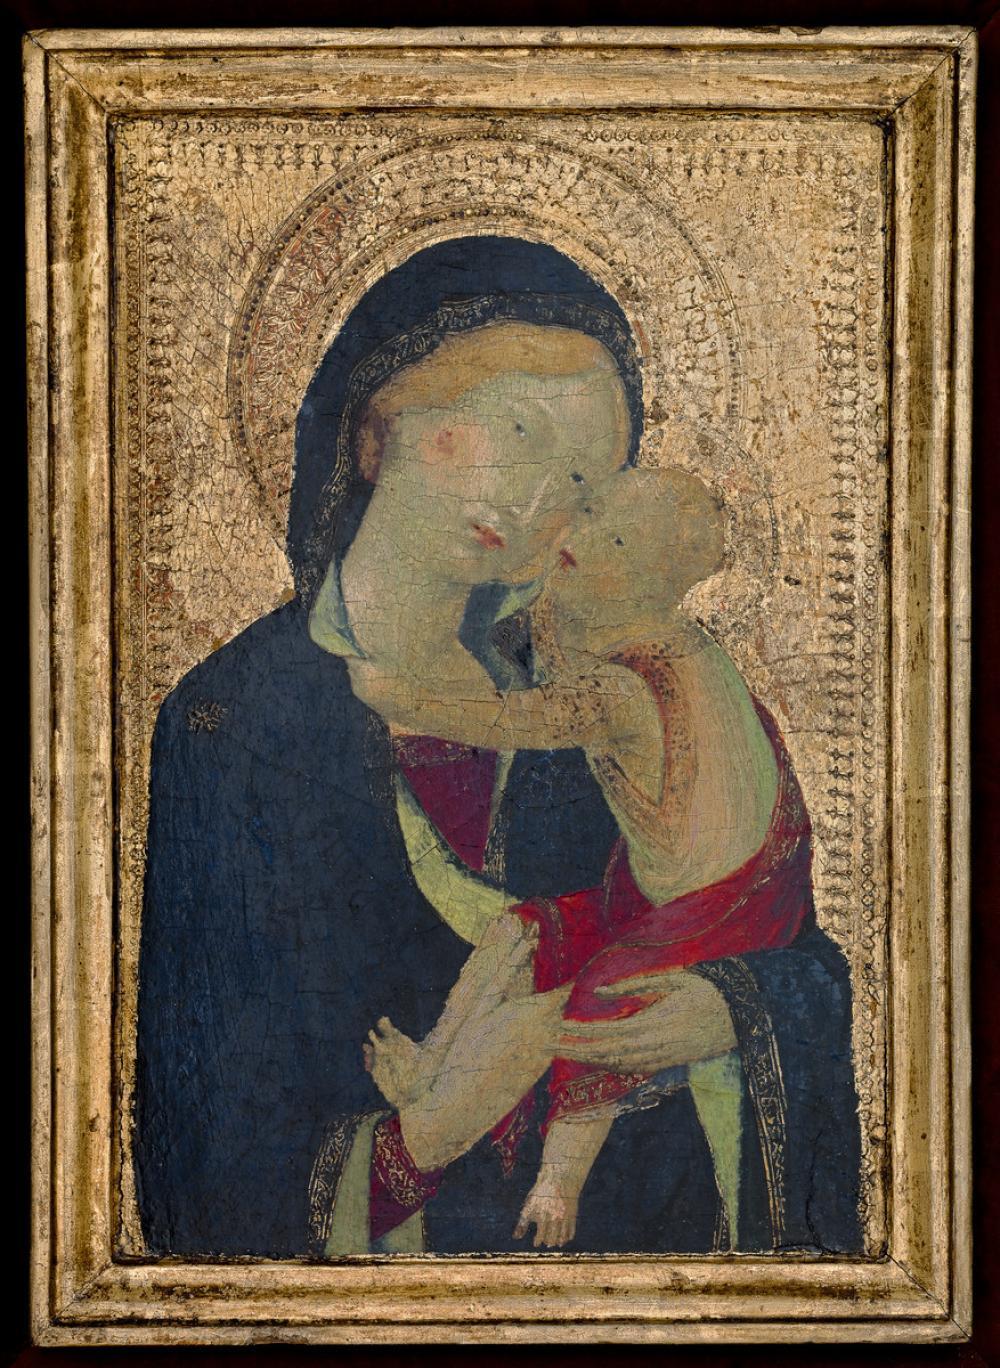 Martini, Simone, Virgin and Child